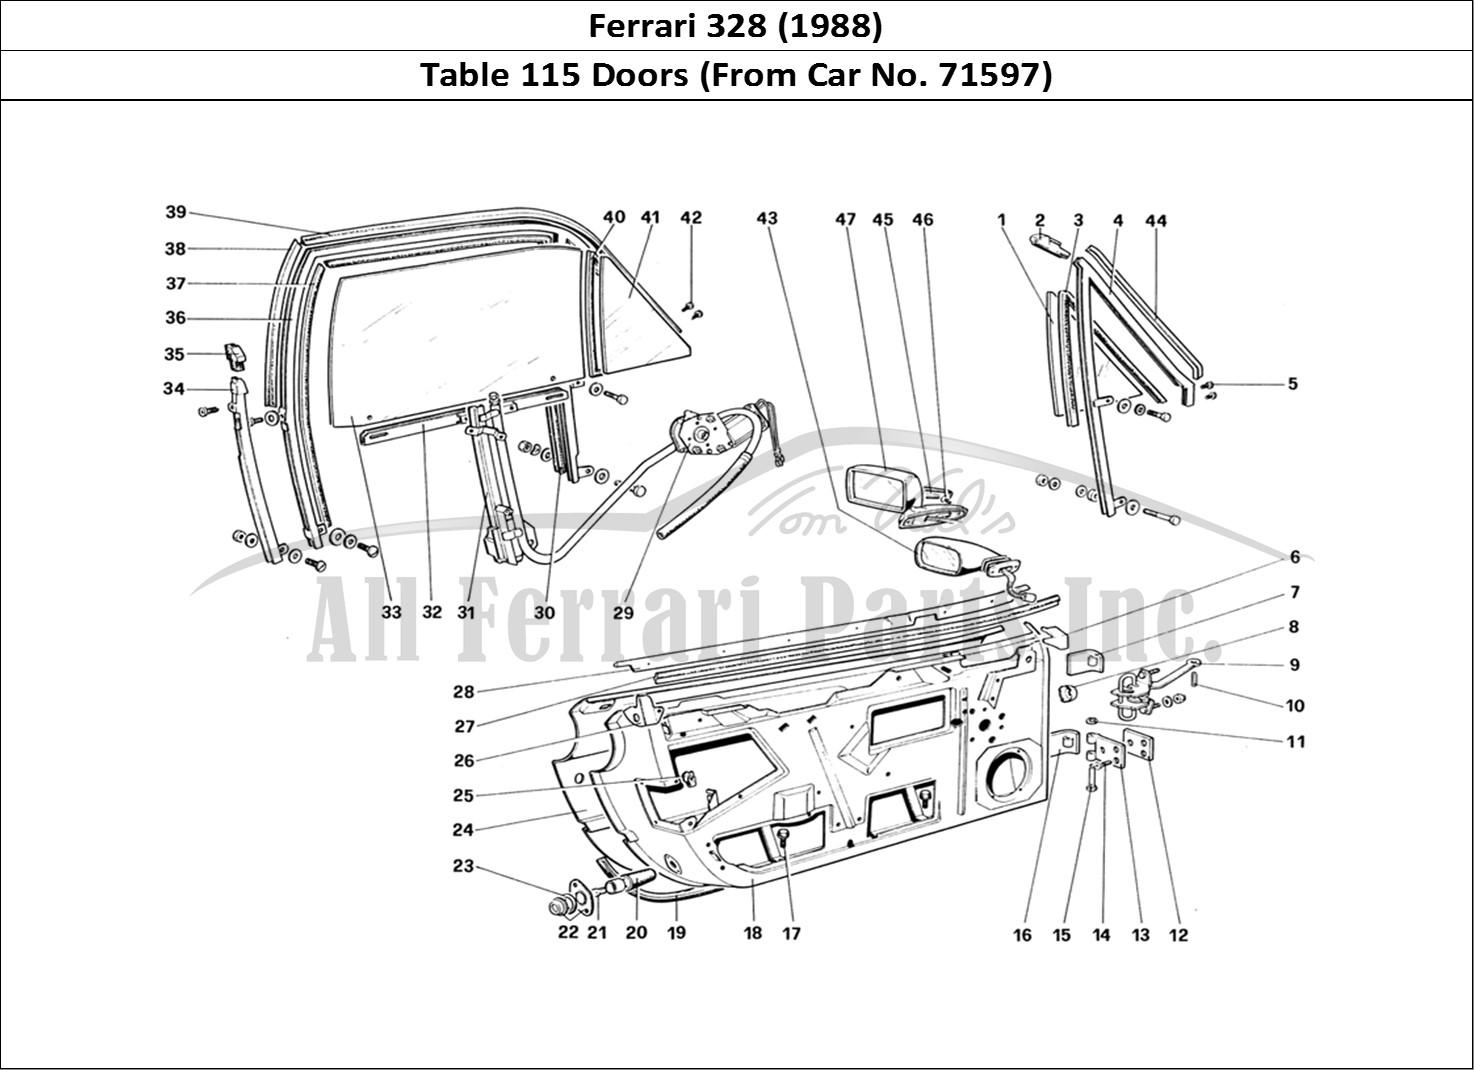 Buy original Ferrari 328 (1988) 115 Doors (From Car No